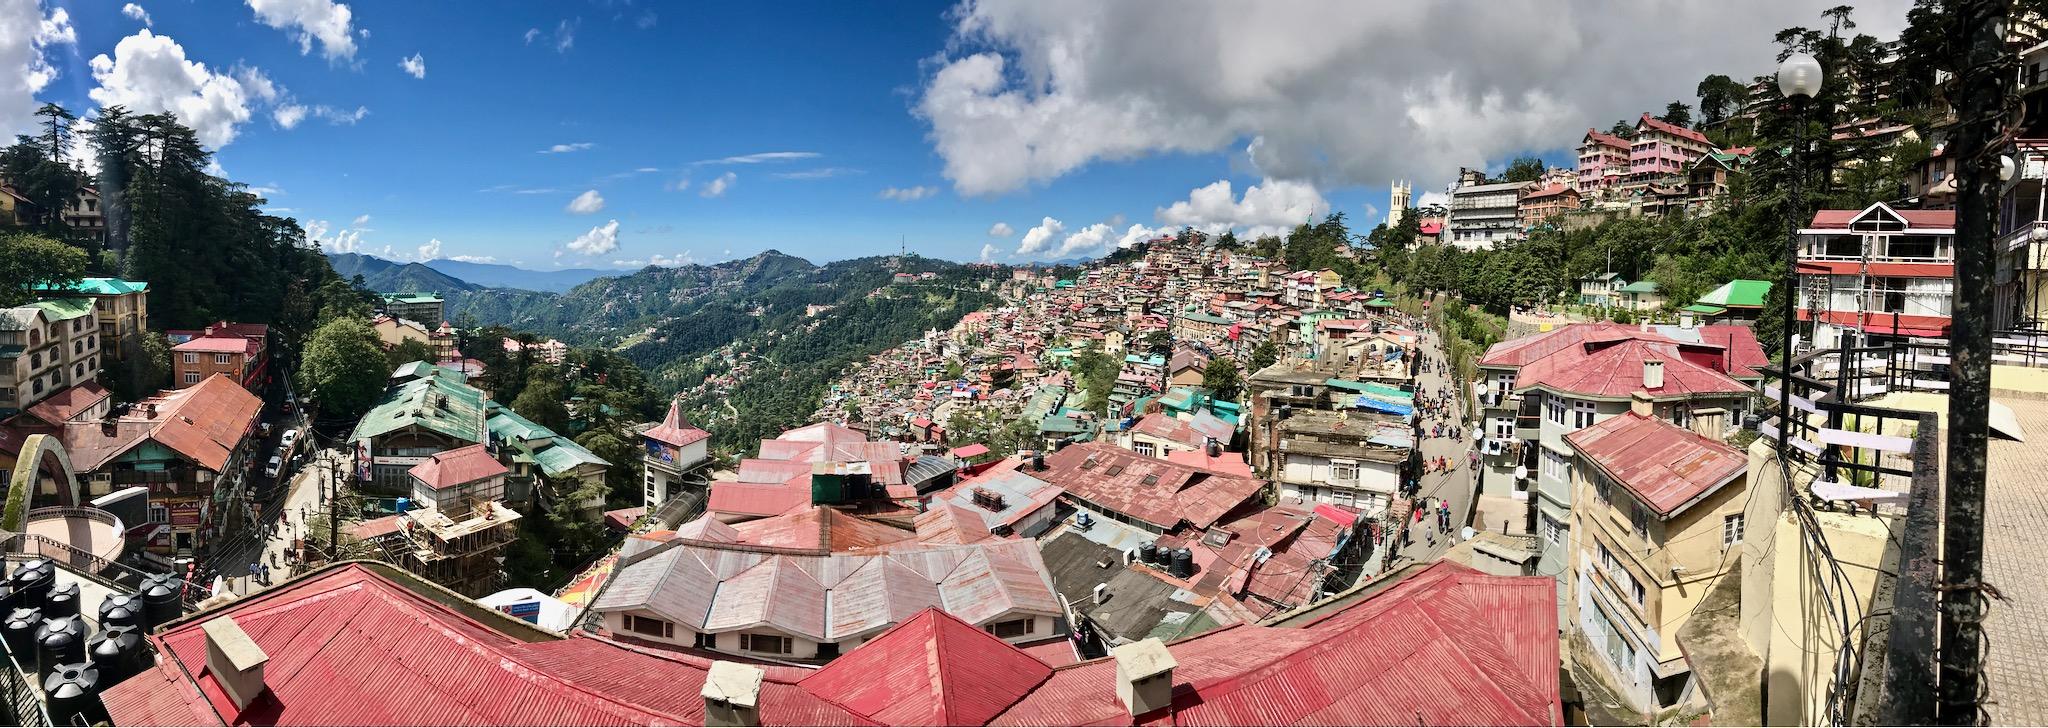 Shimla Panorama